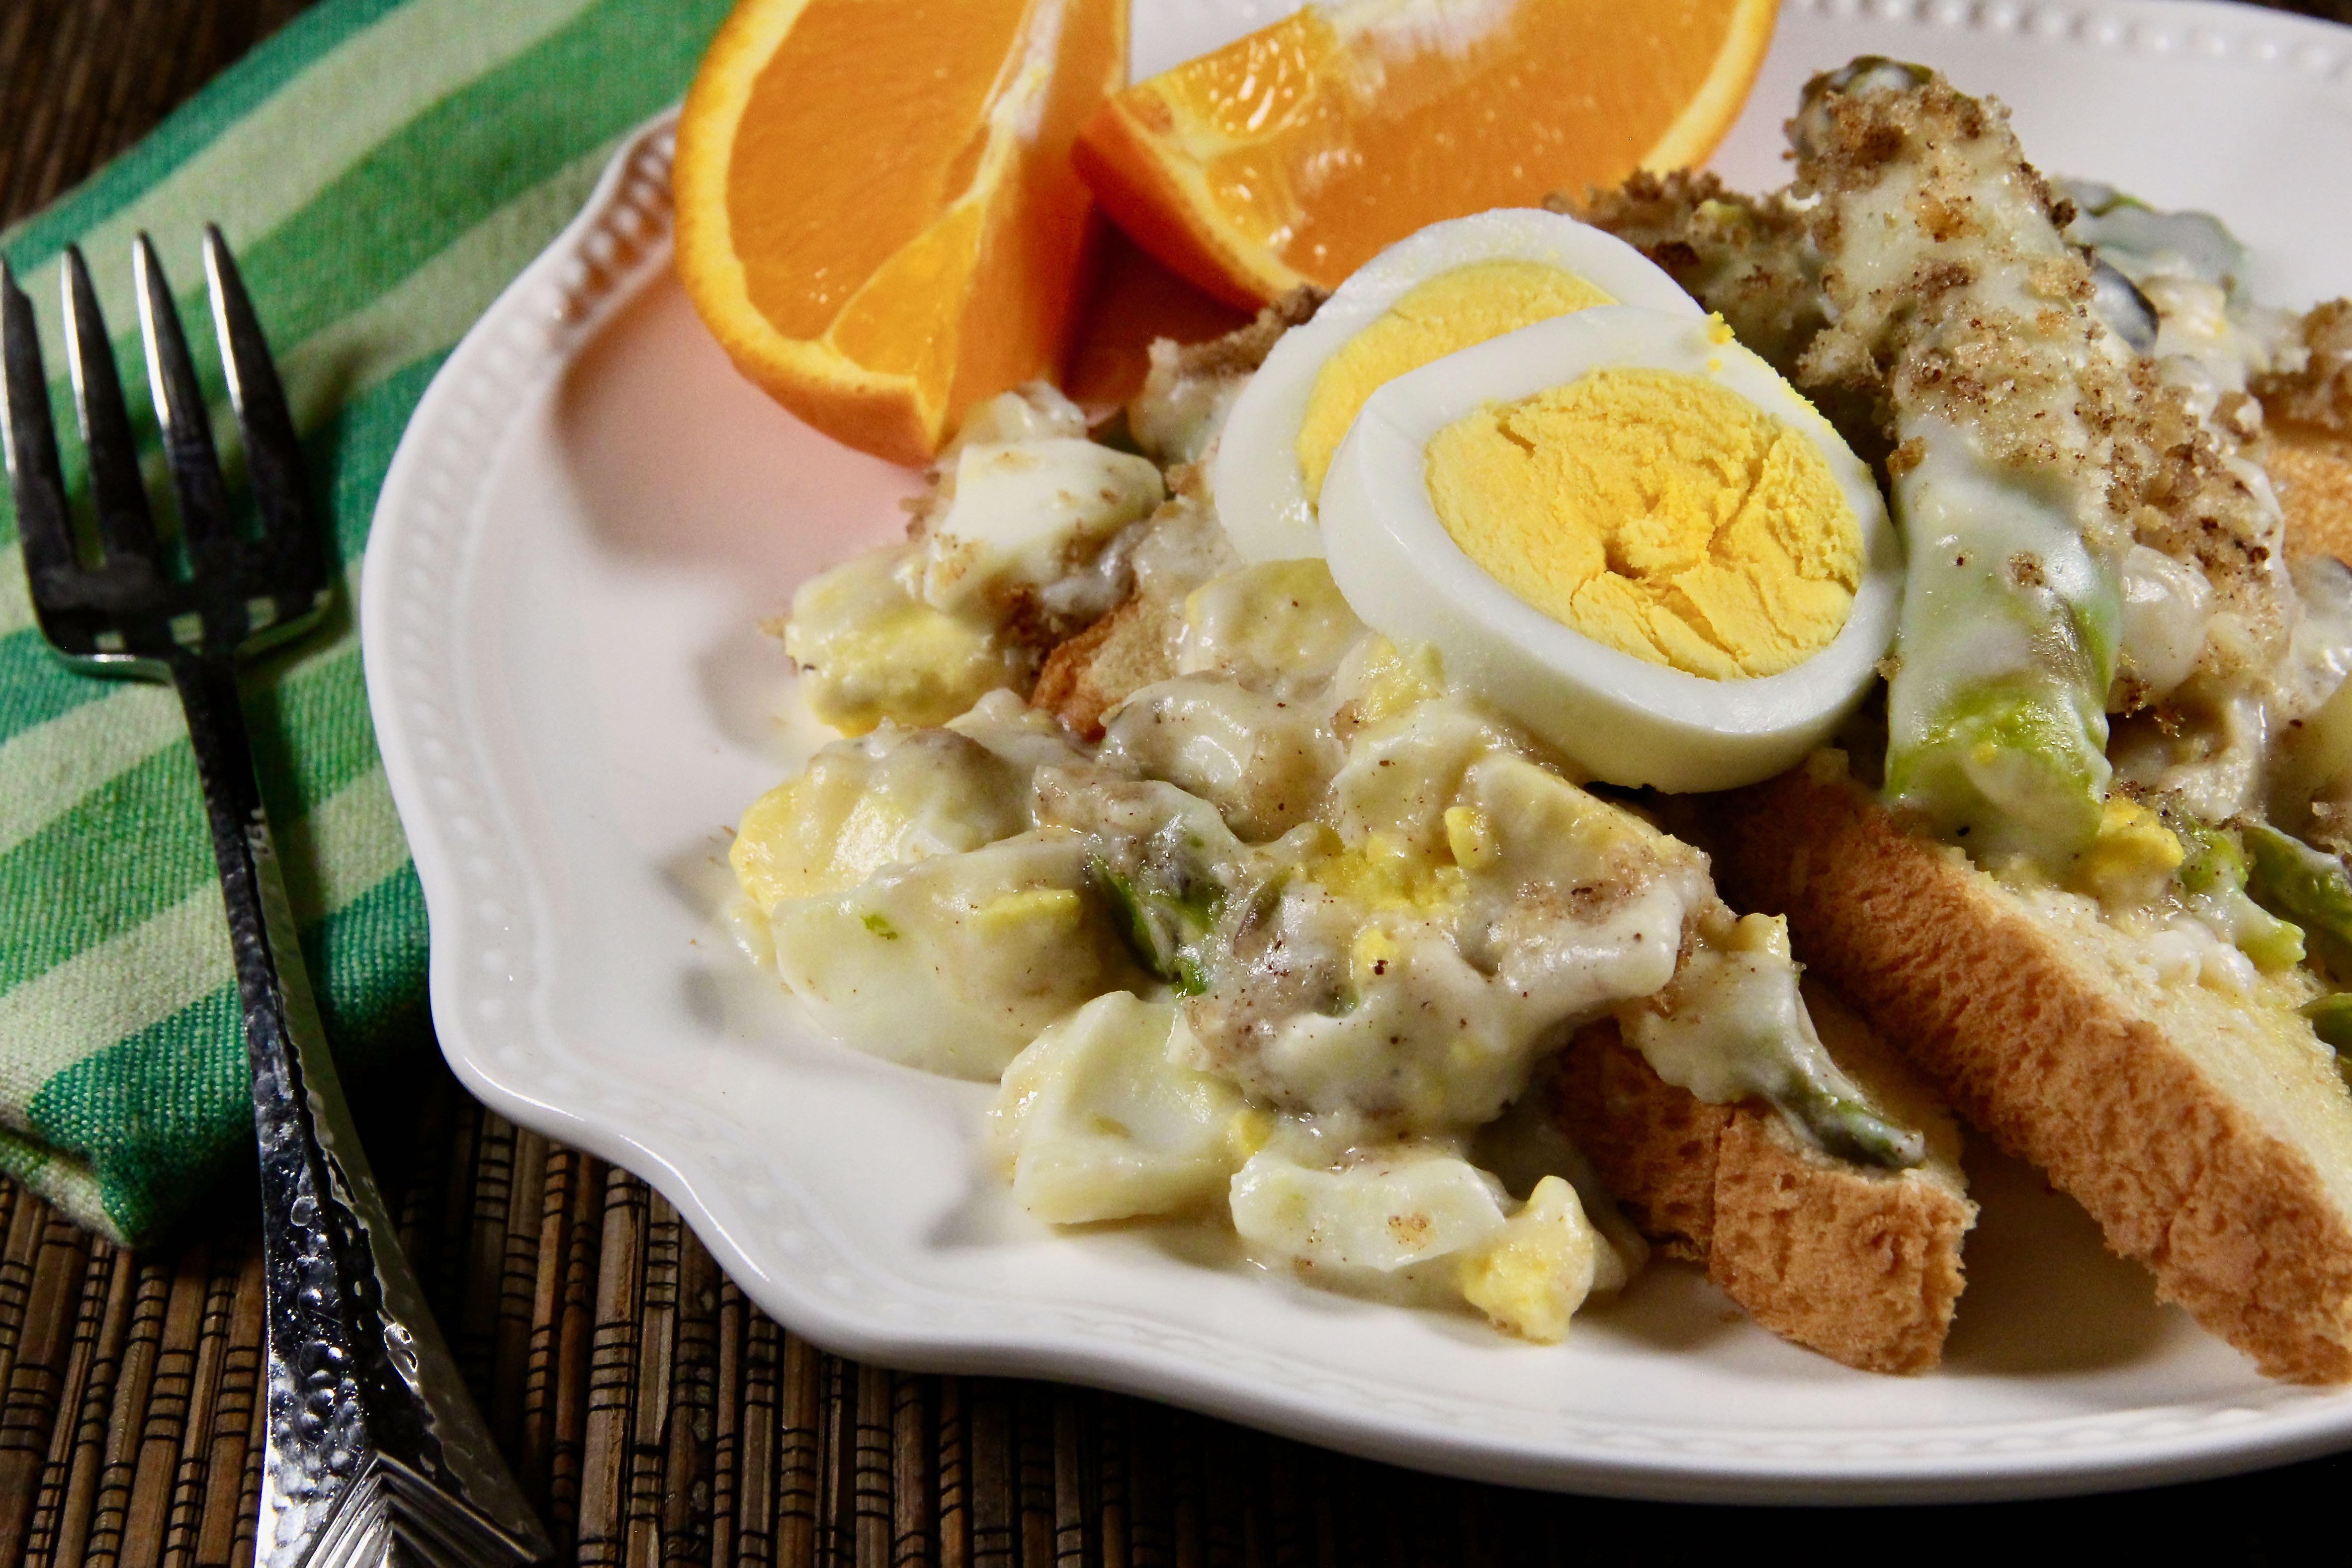 Asparagus Casserole with Hard-Boiled Eggs